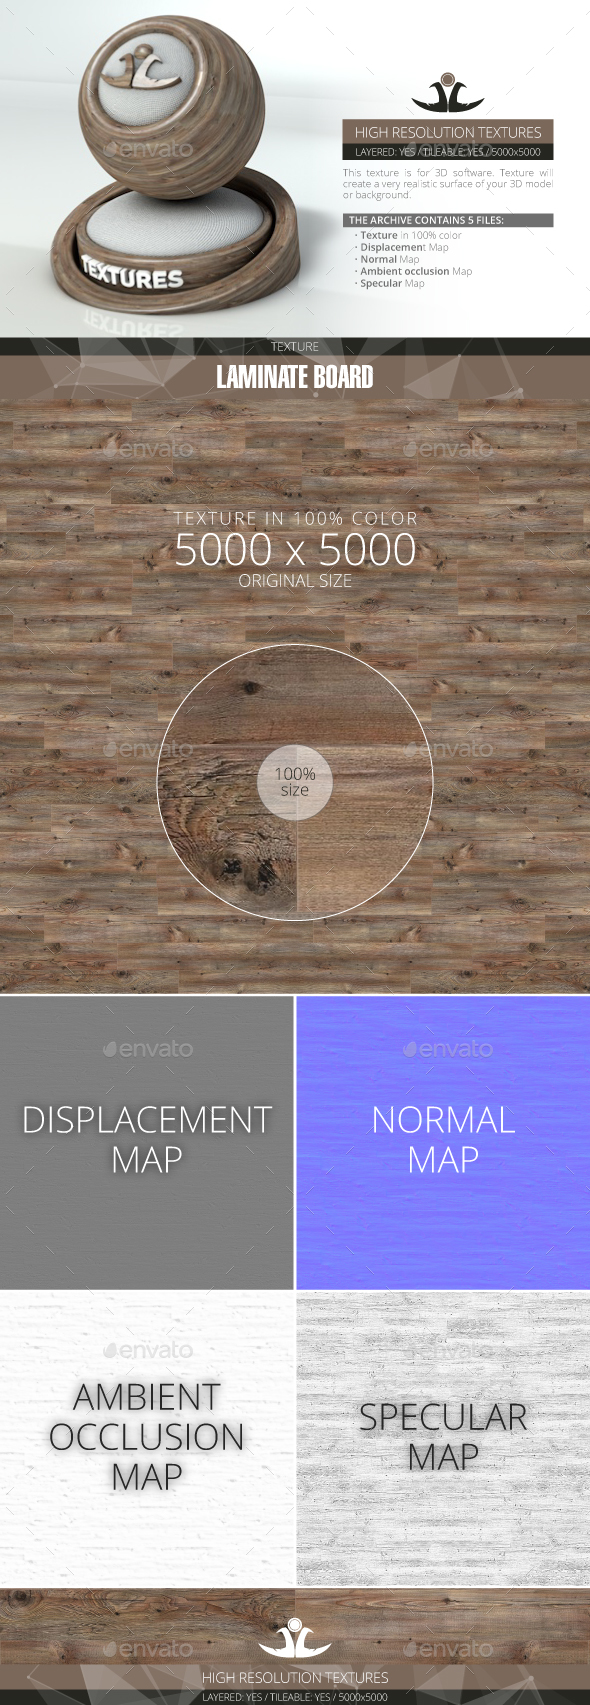 Laminate Board 12 - 3DOcean Item for Sale